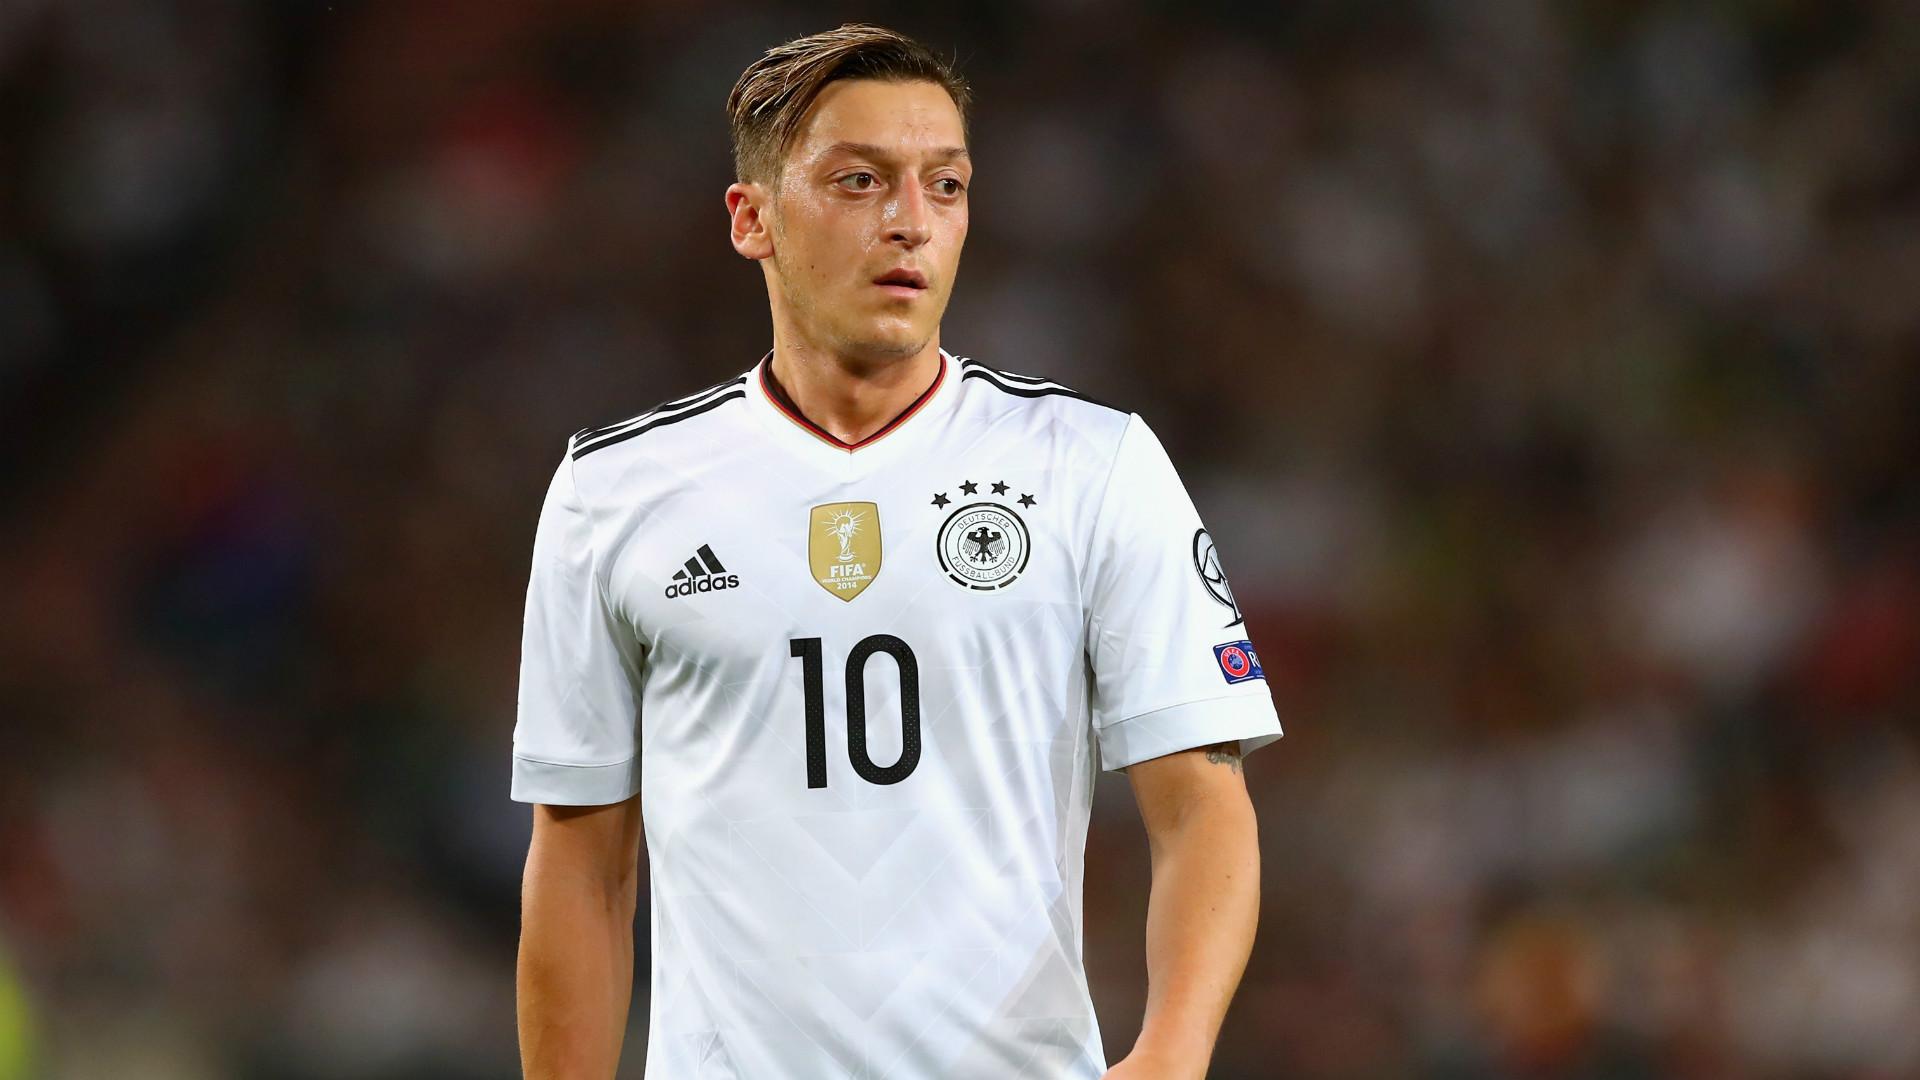 Mesut Ozil Germany - Toni Kroos Fifa World Cup 2018 , HD Wallpaper & Backgrounds